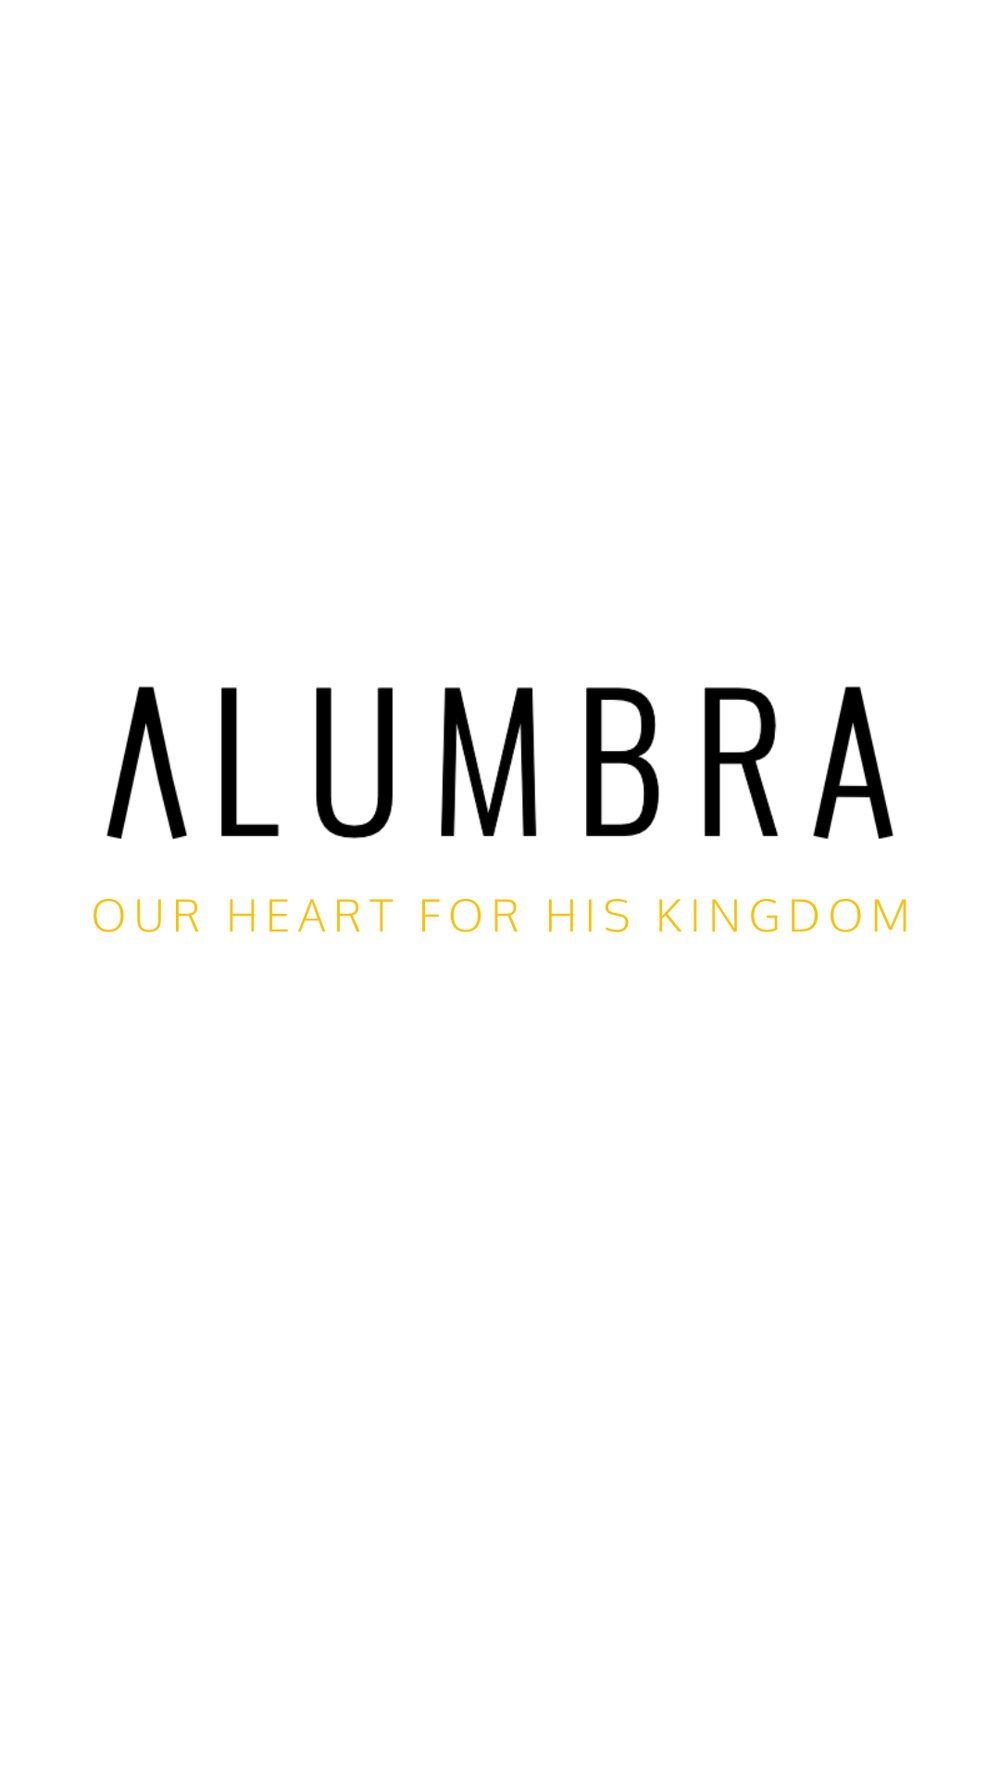 Copy of Alumbra logo and tagline